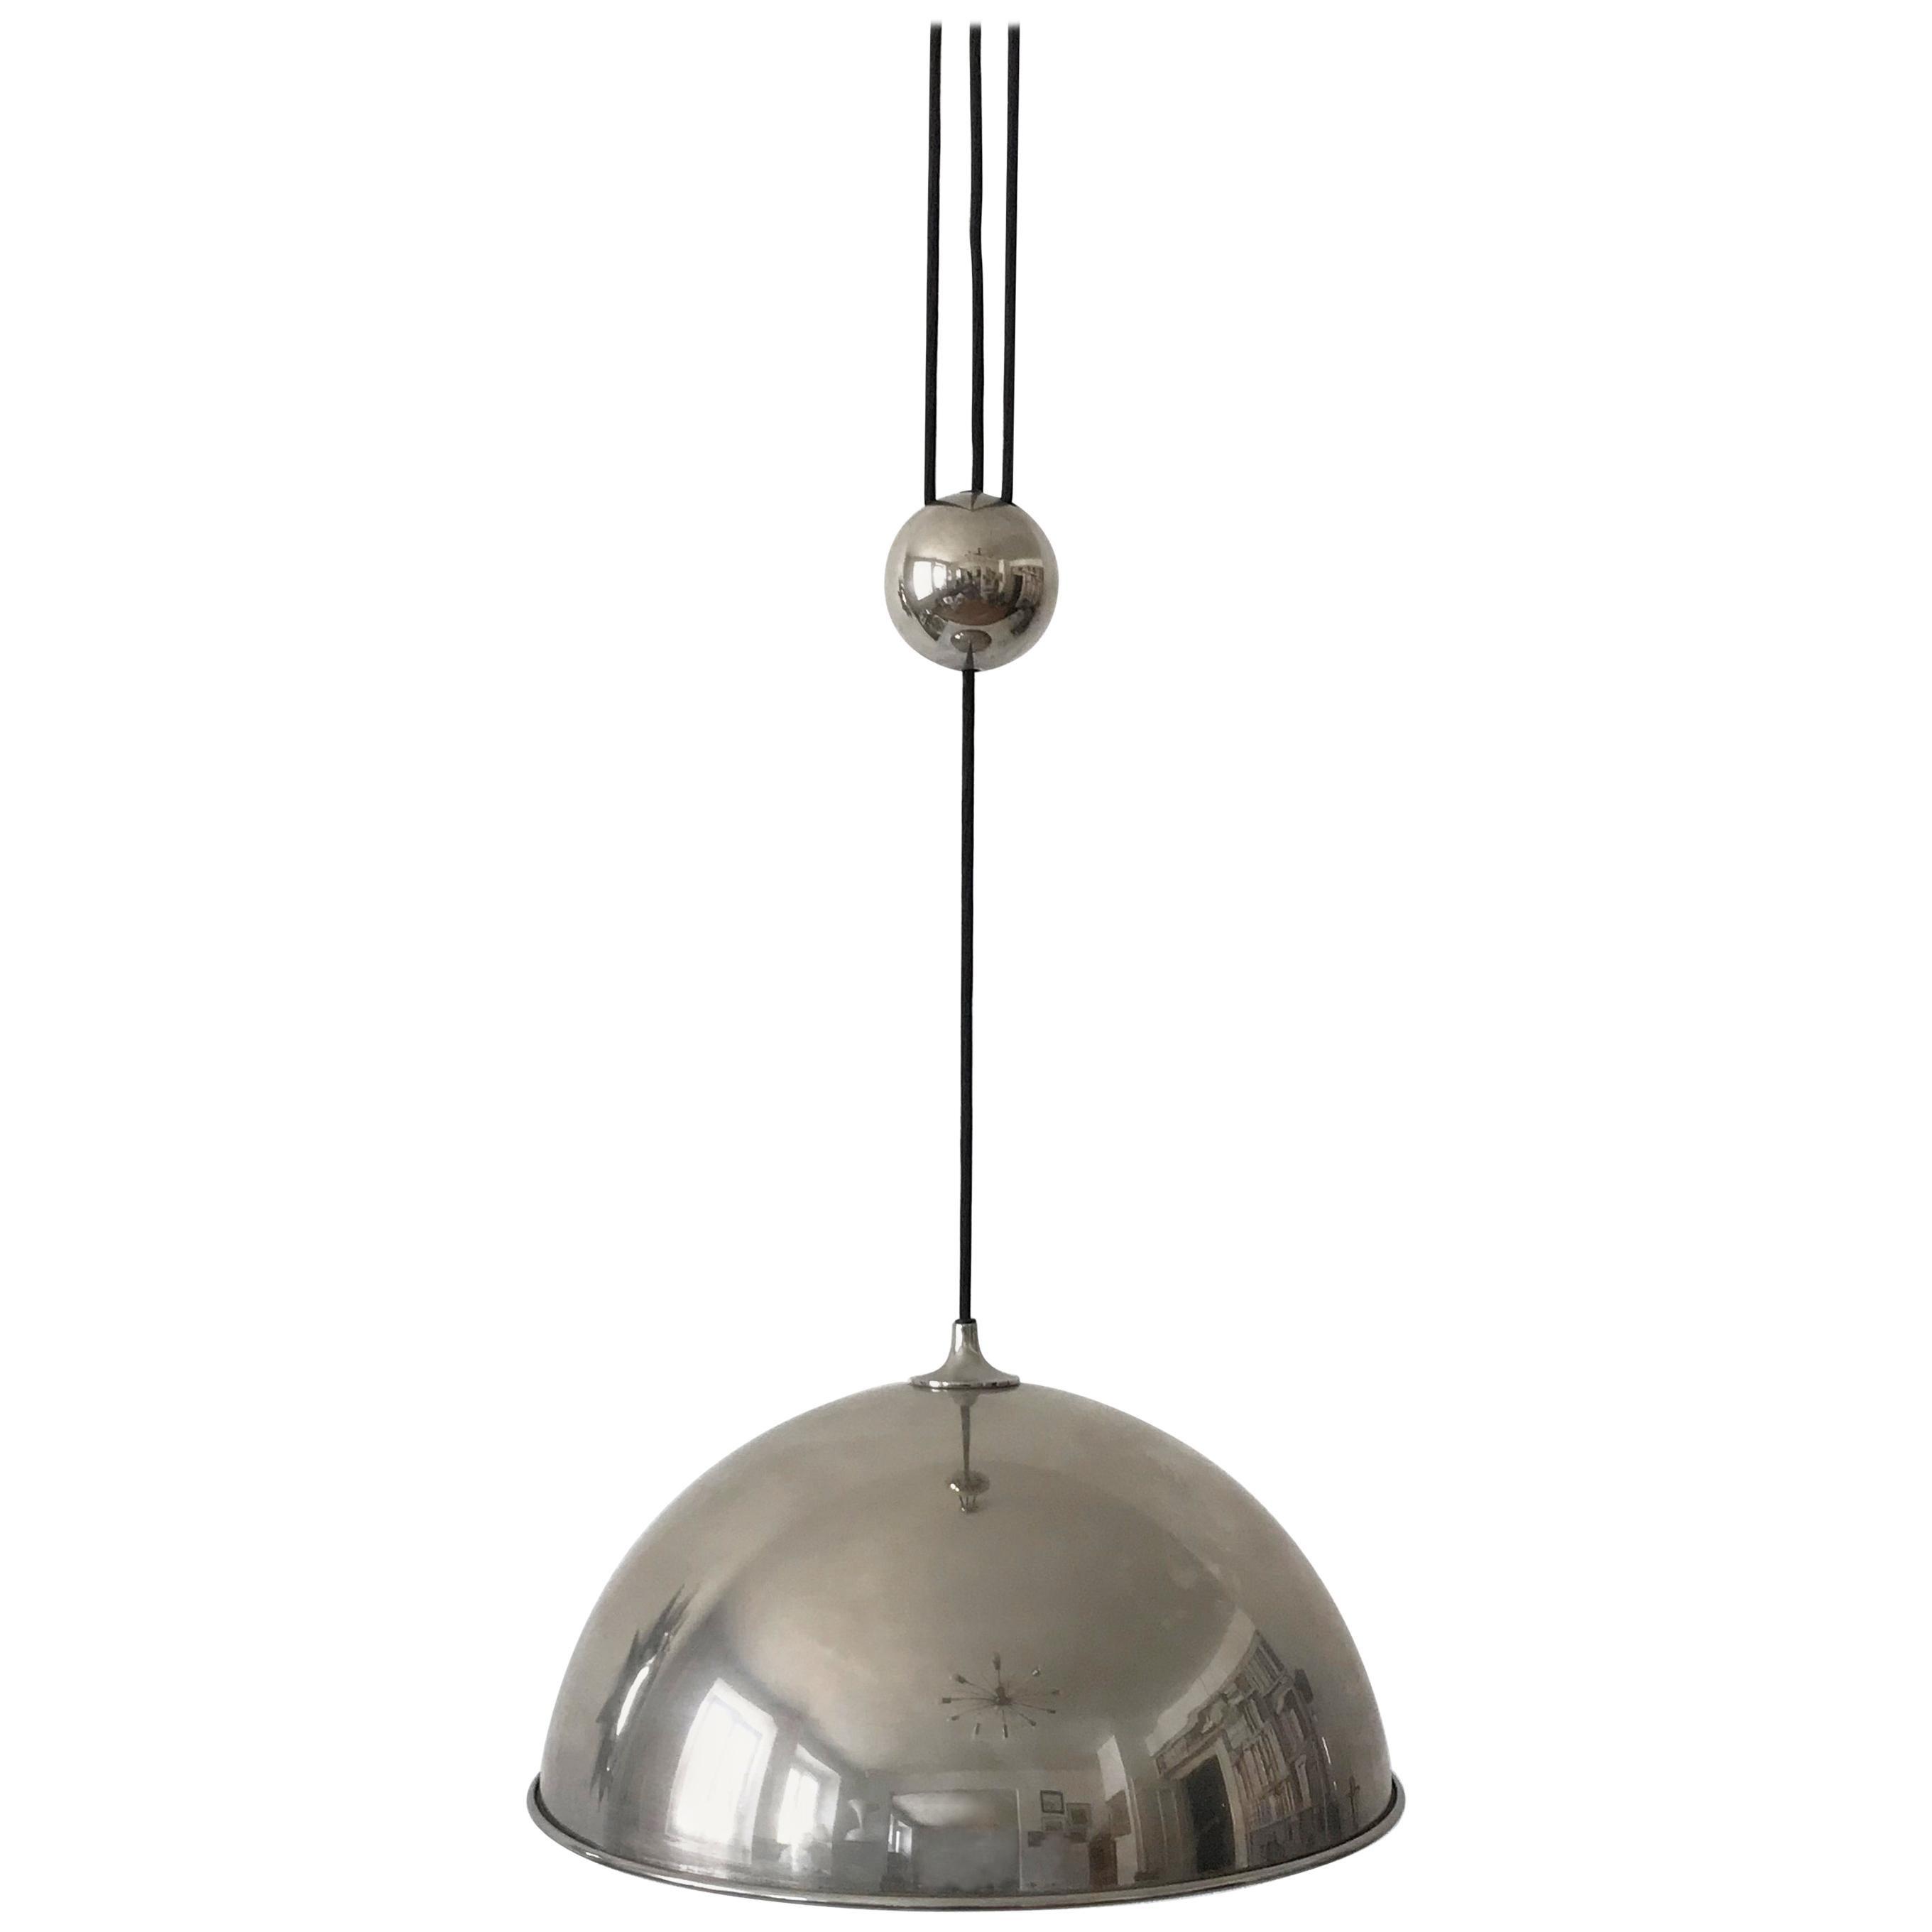 Elegant Counter Balance Pendant Lamp by Florian Schulz Germany 1980s